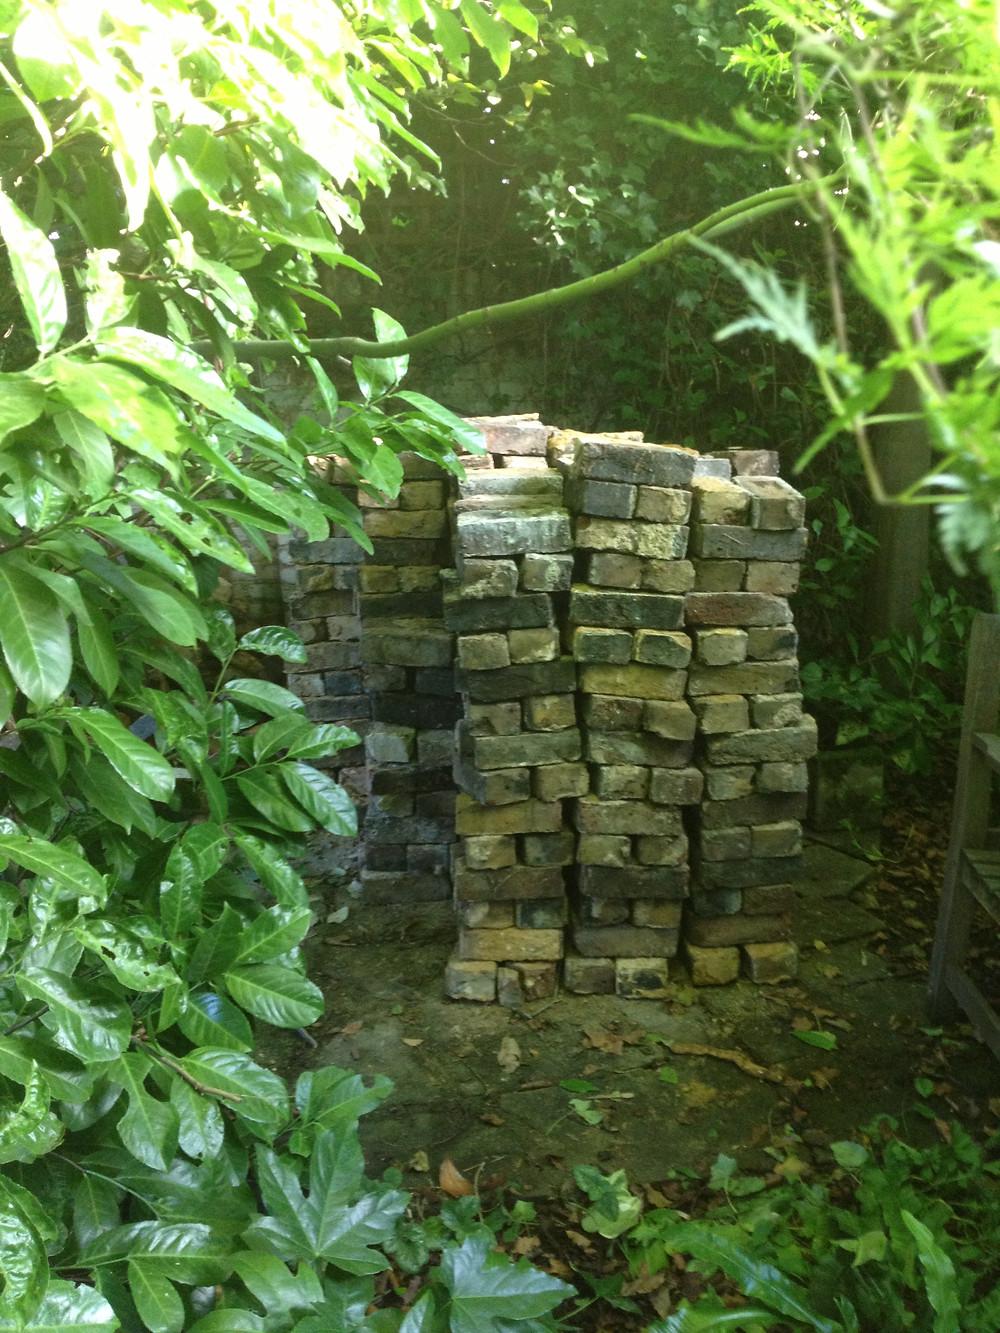 Reclaimed Bricks for Garden Wall